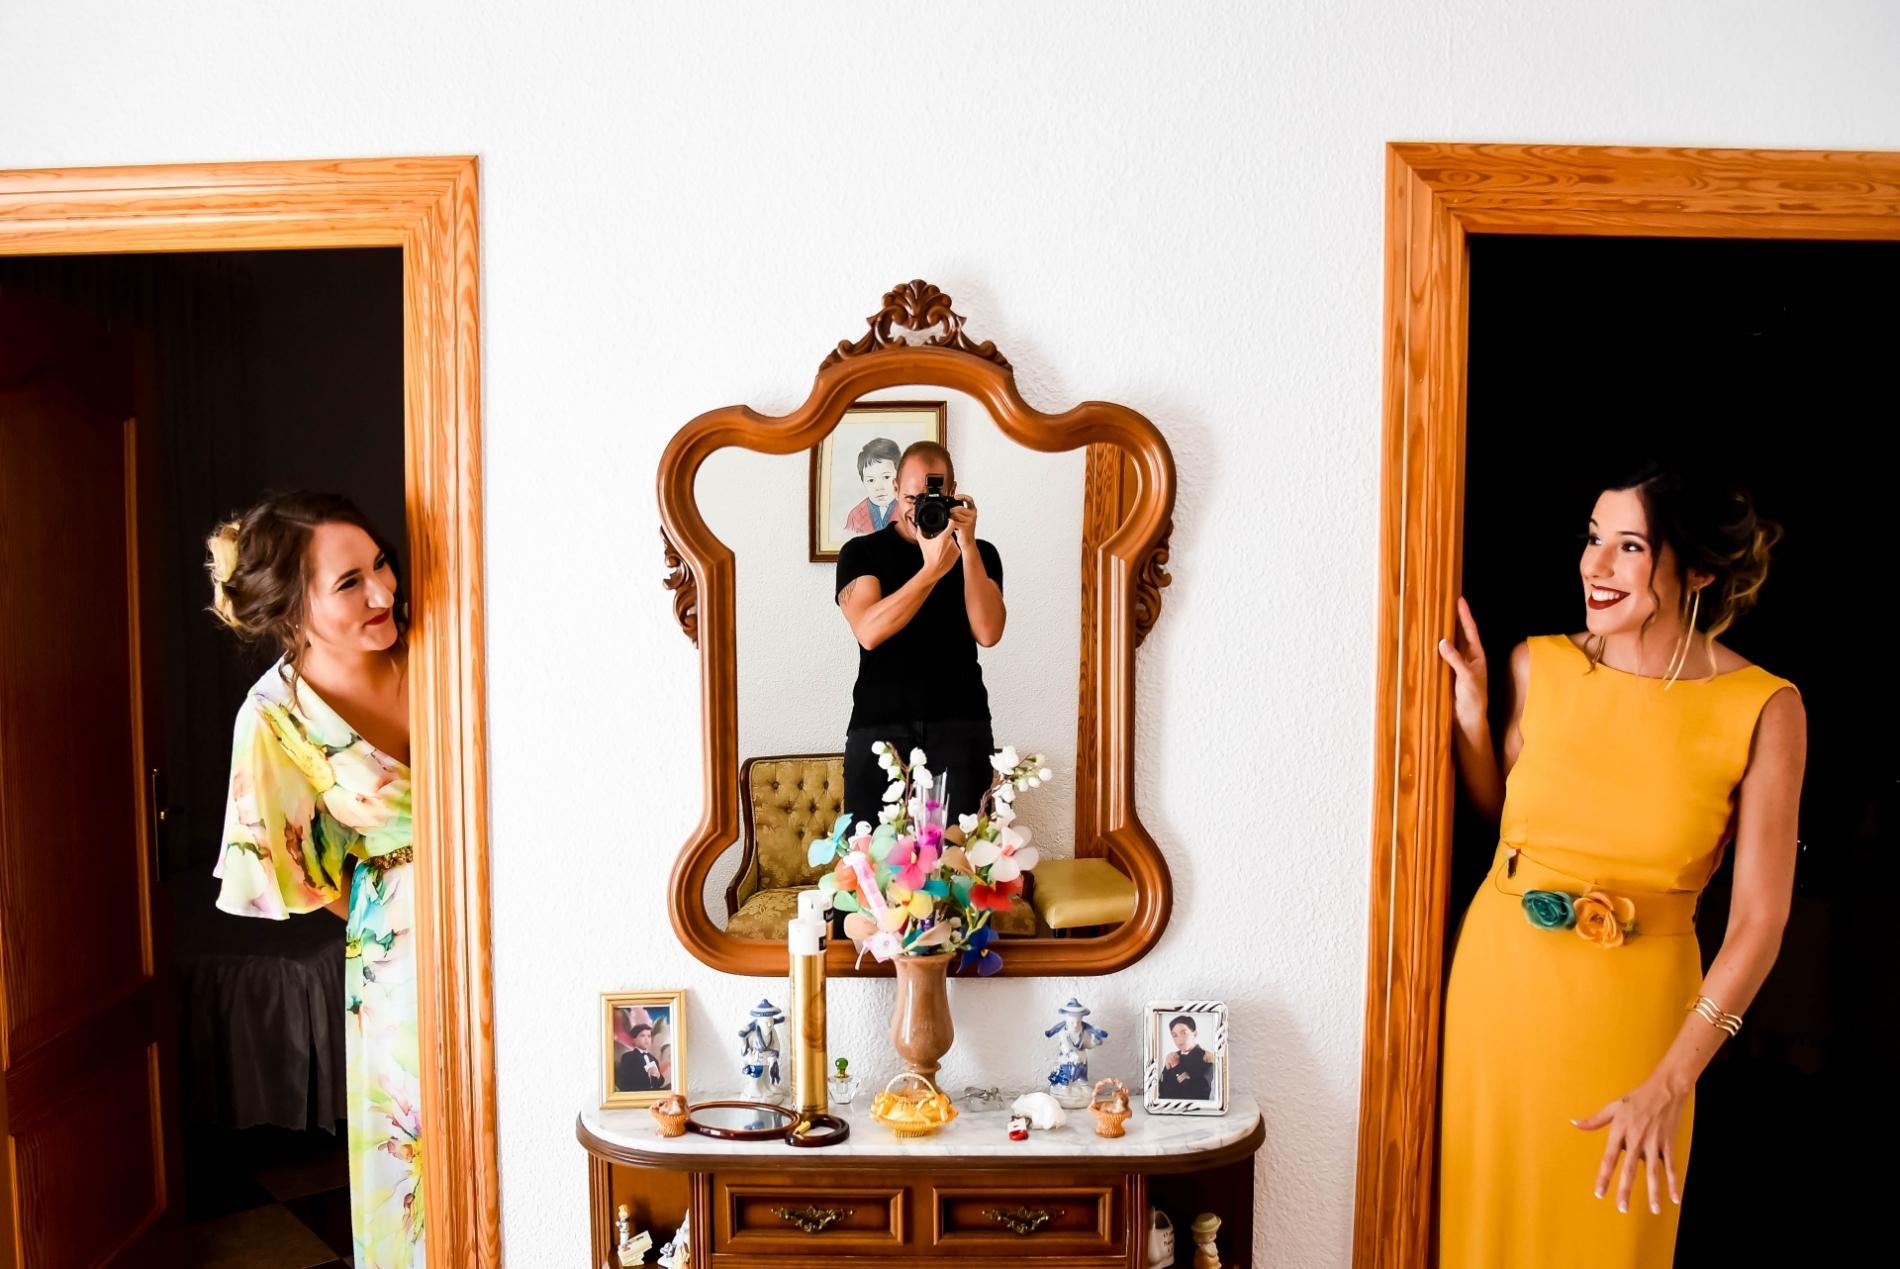 Murcia Hochzeitsfotograf in Aktion | Eduardo Blanco Fotografie